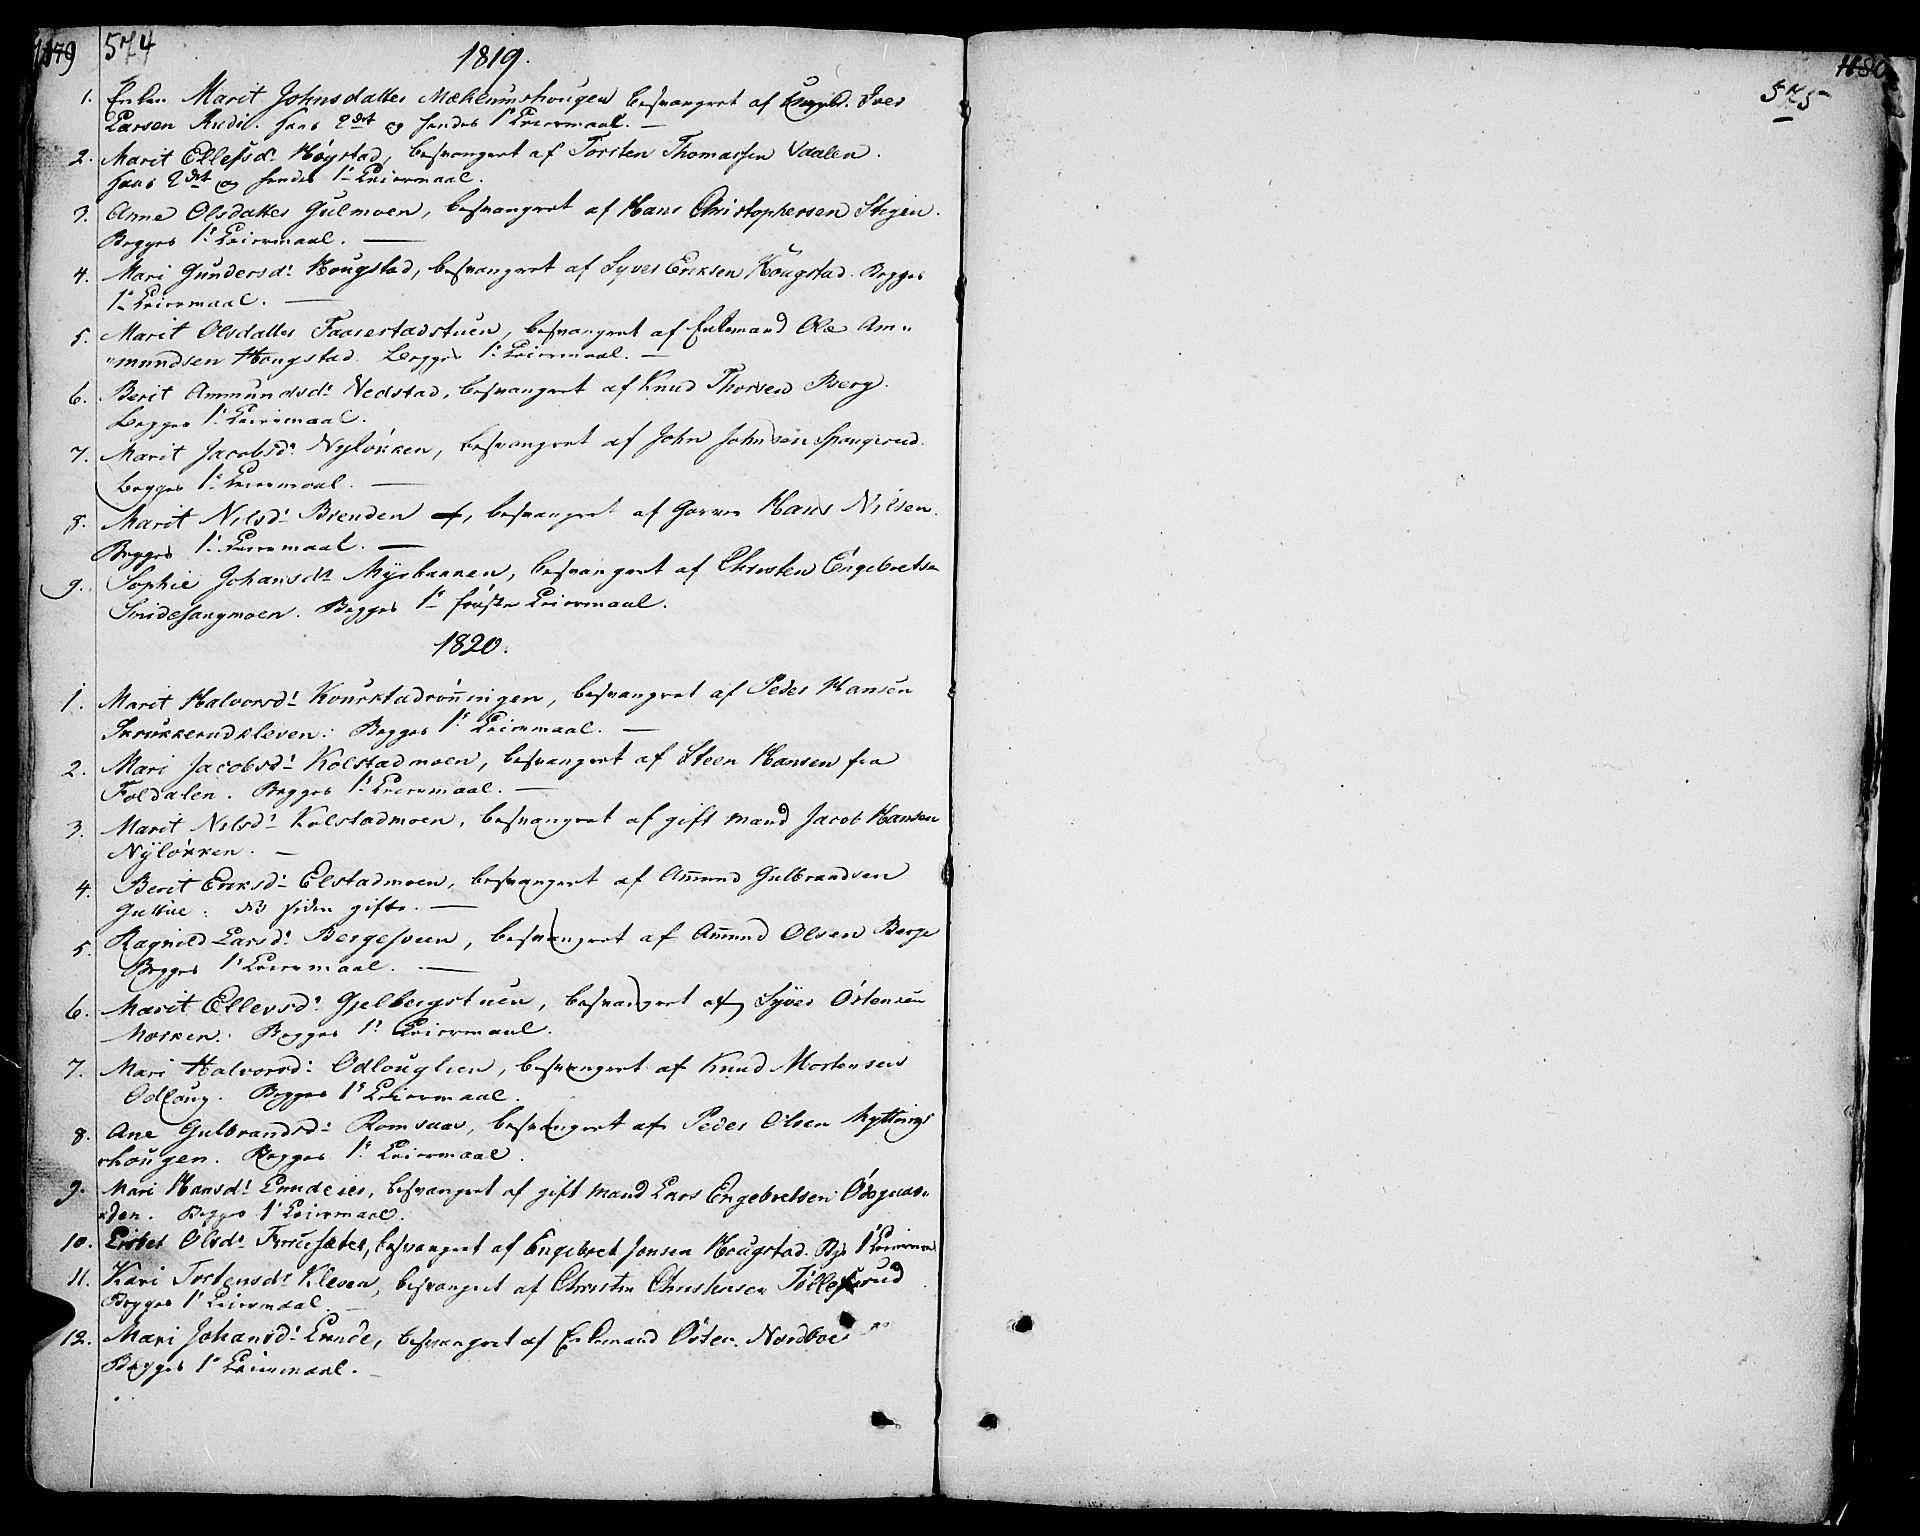 SAH, Ringebu prestekontor, Ministerialbok nr. 3, 1781-1820, s. 574-575